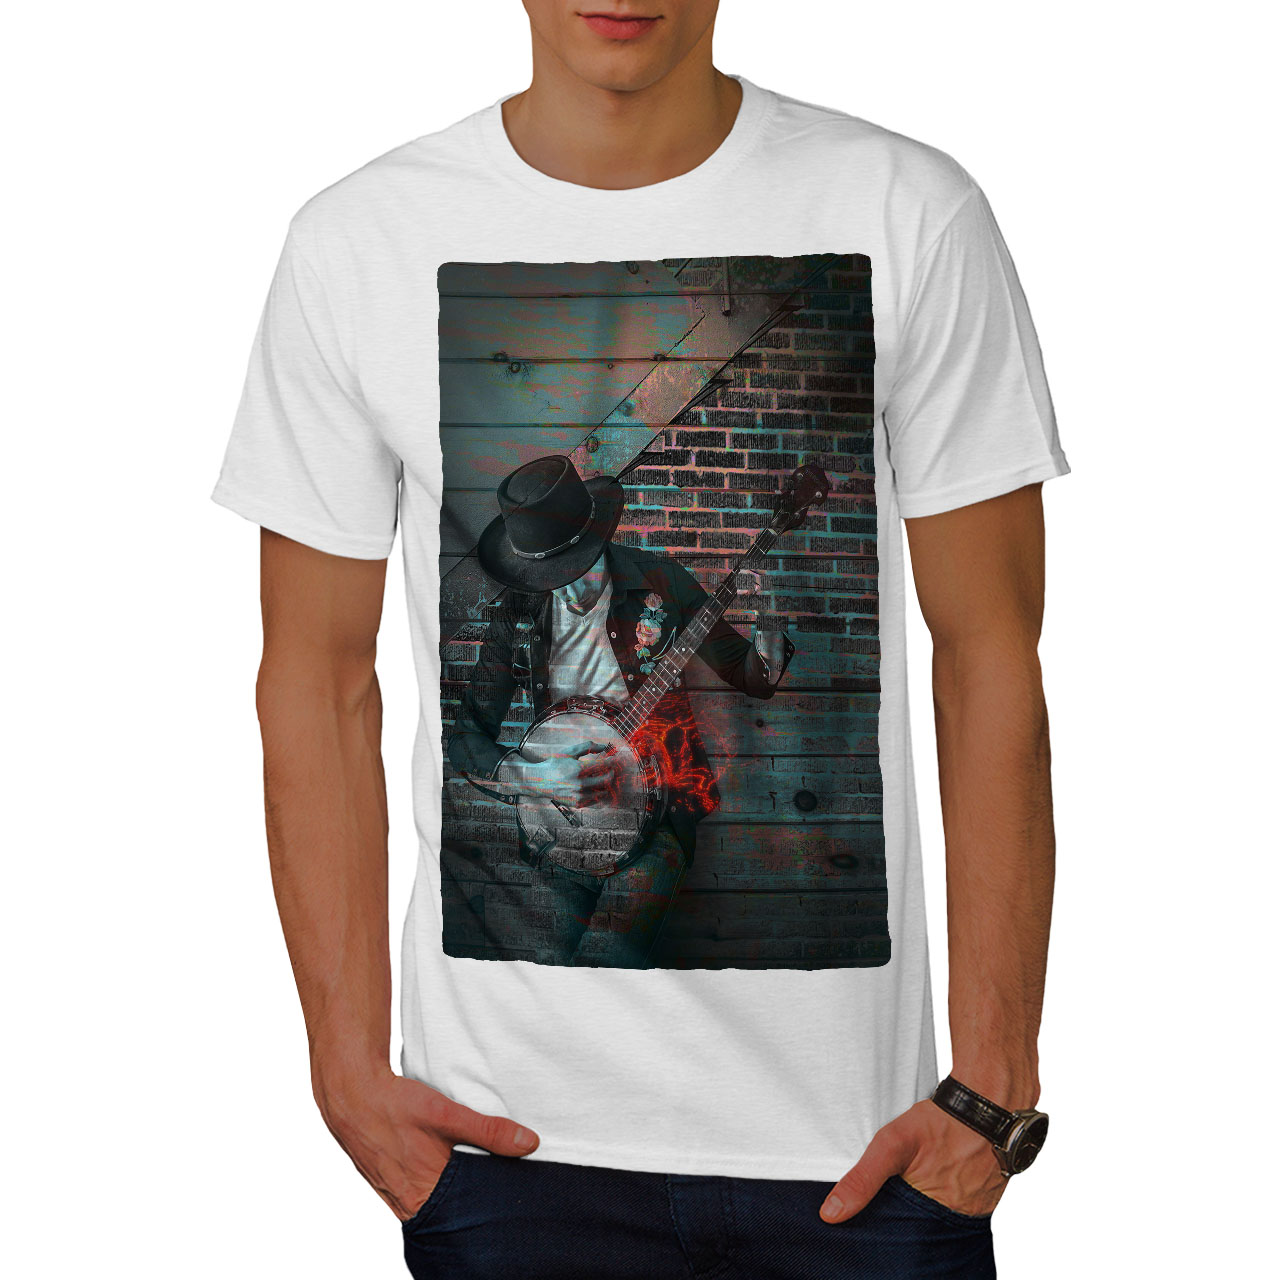 Wellcoda Street Art Graffiti Mens T-shirt American Graphic Design Printed Tee